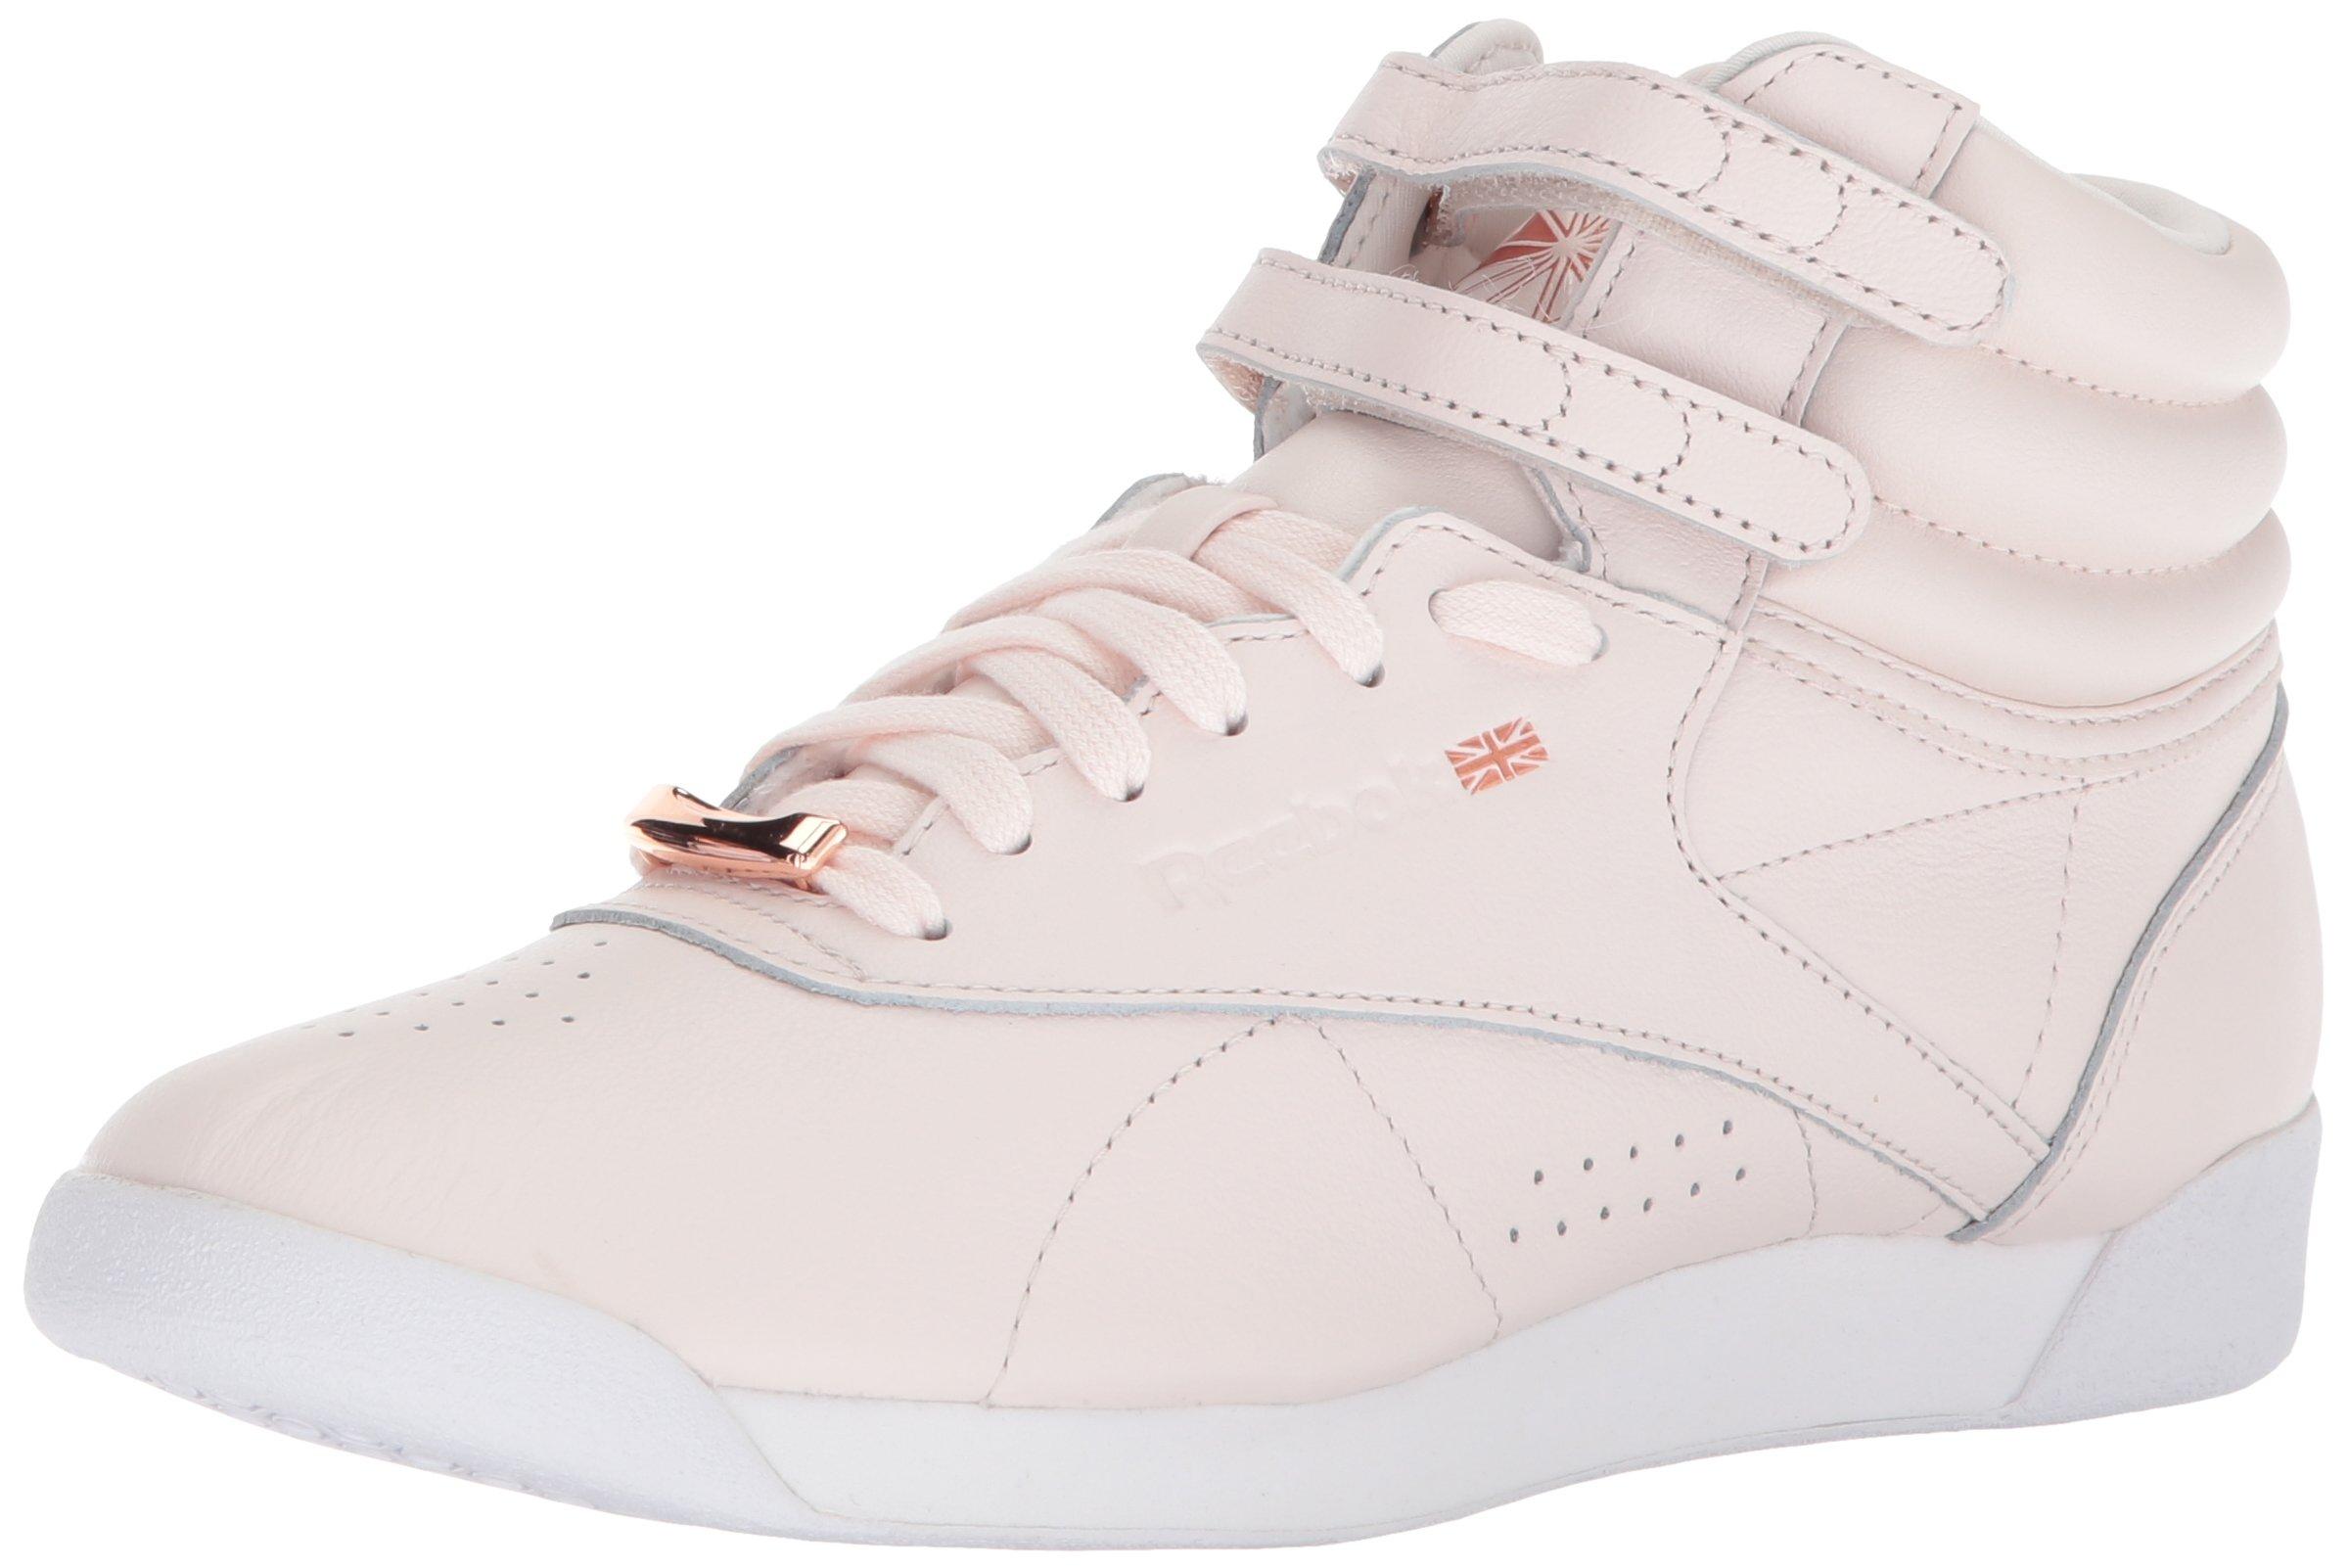 Reebok Women's F/S Hi Muted Walking Shoe, Pale Pink/White/Cool Shadow, 8.5 M US